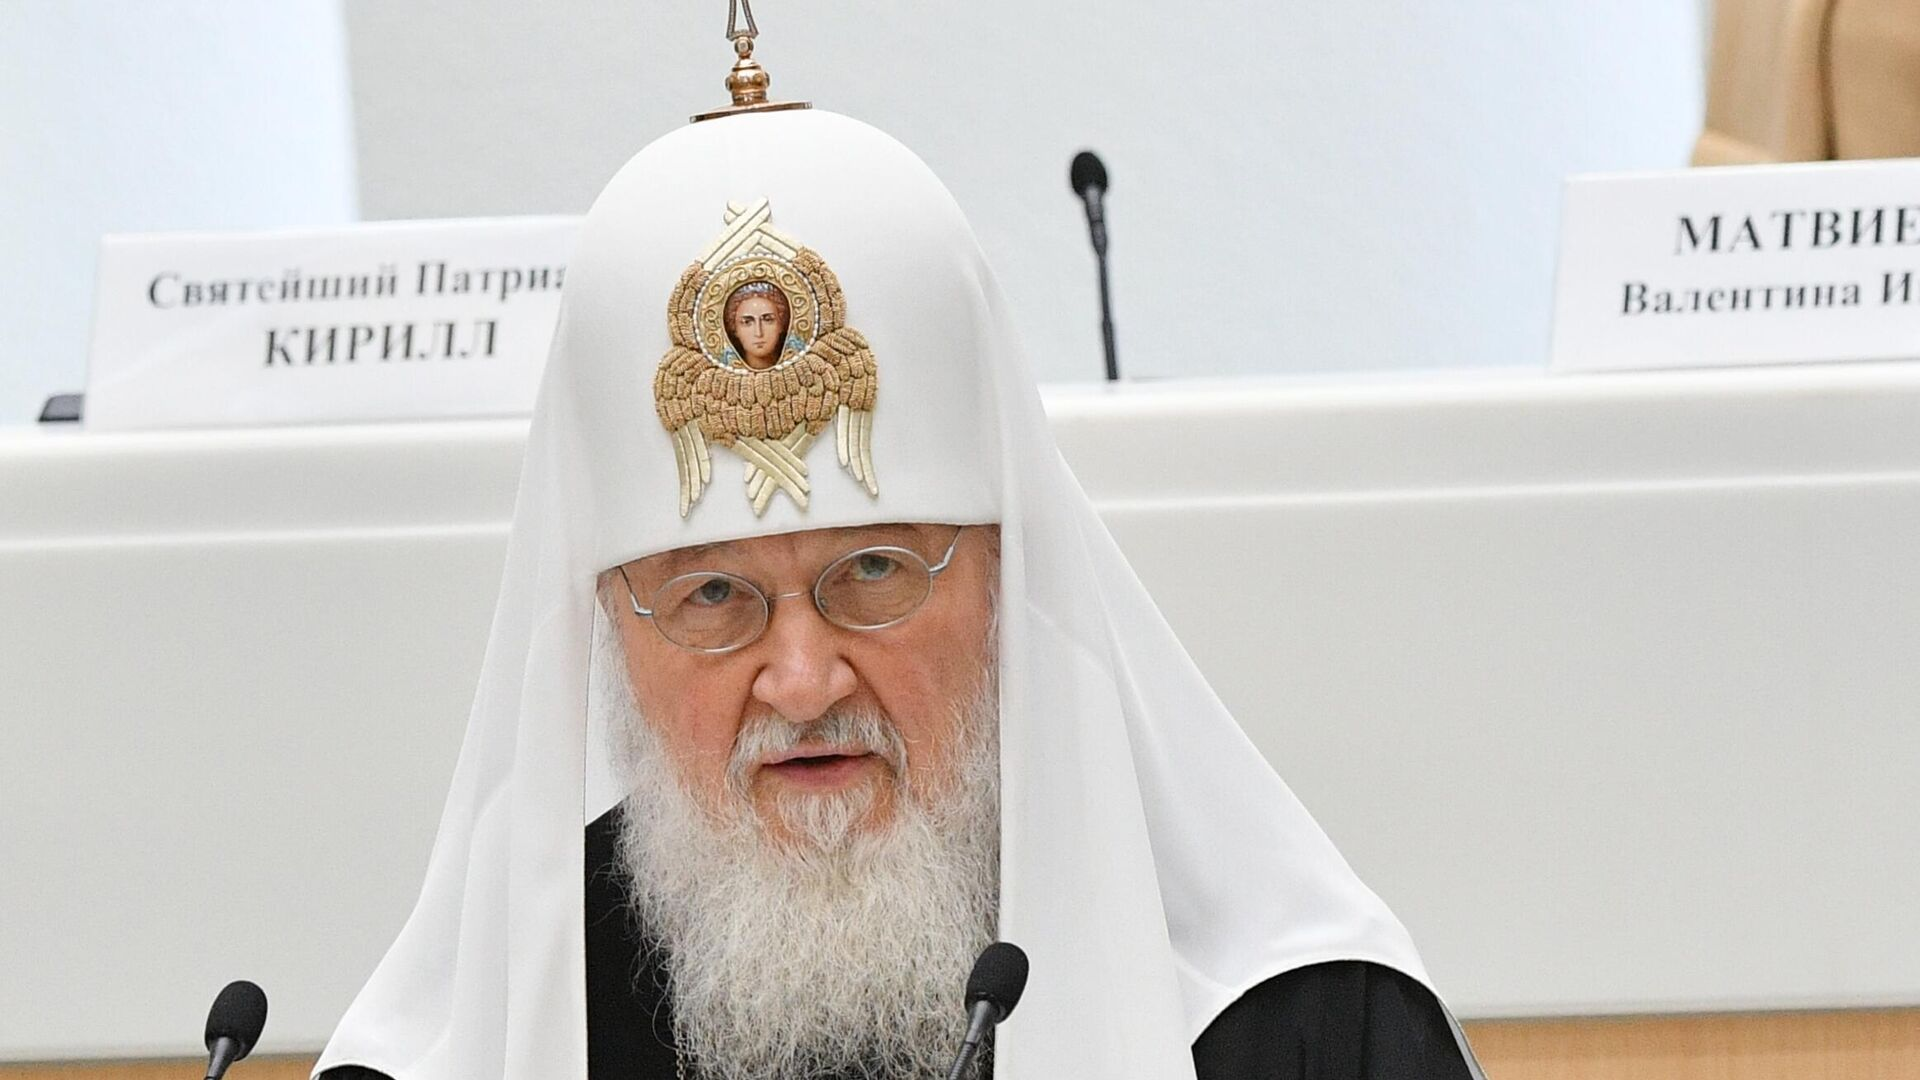 Патриарх Московский и всея Руси Кирилл  - РИА Новости, 1920, 27.02.2020